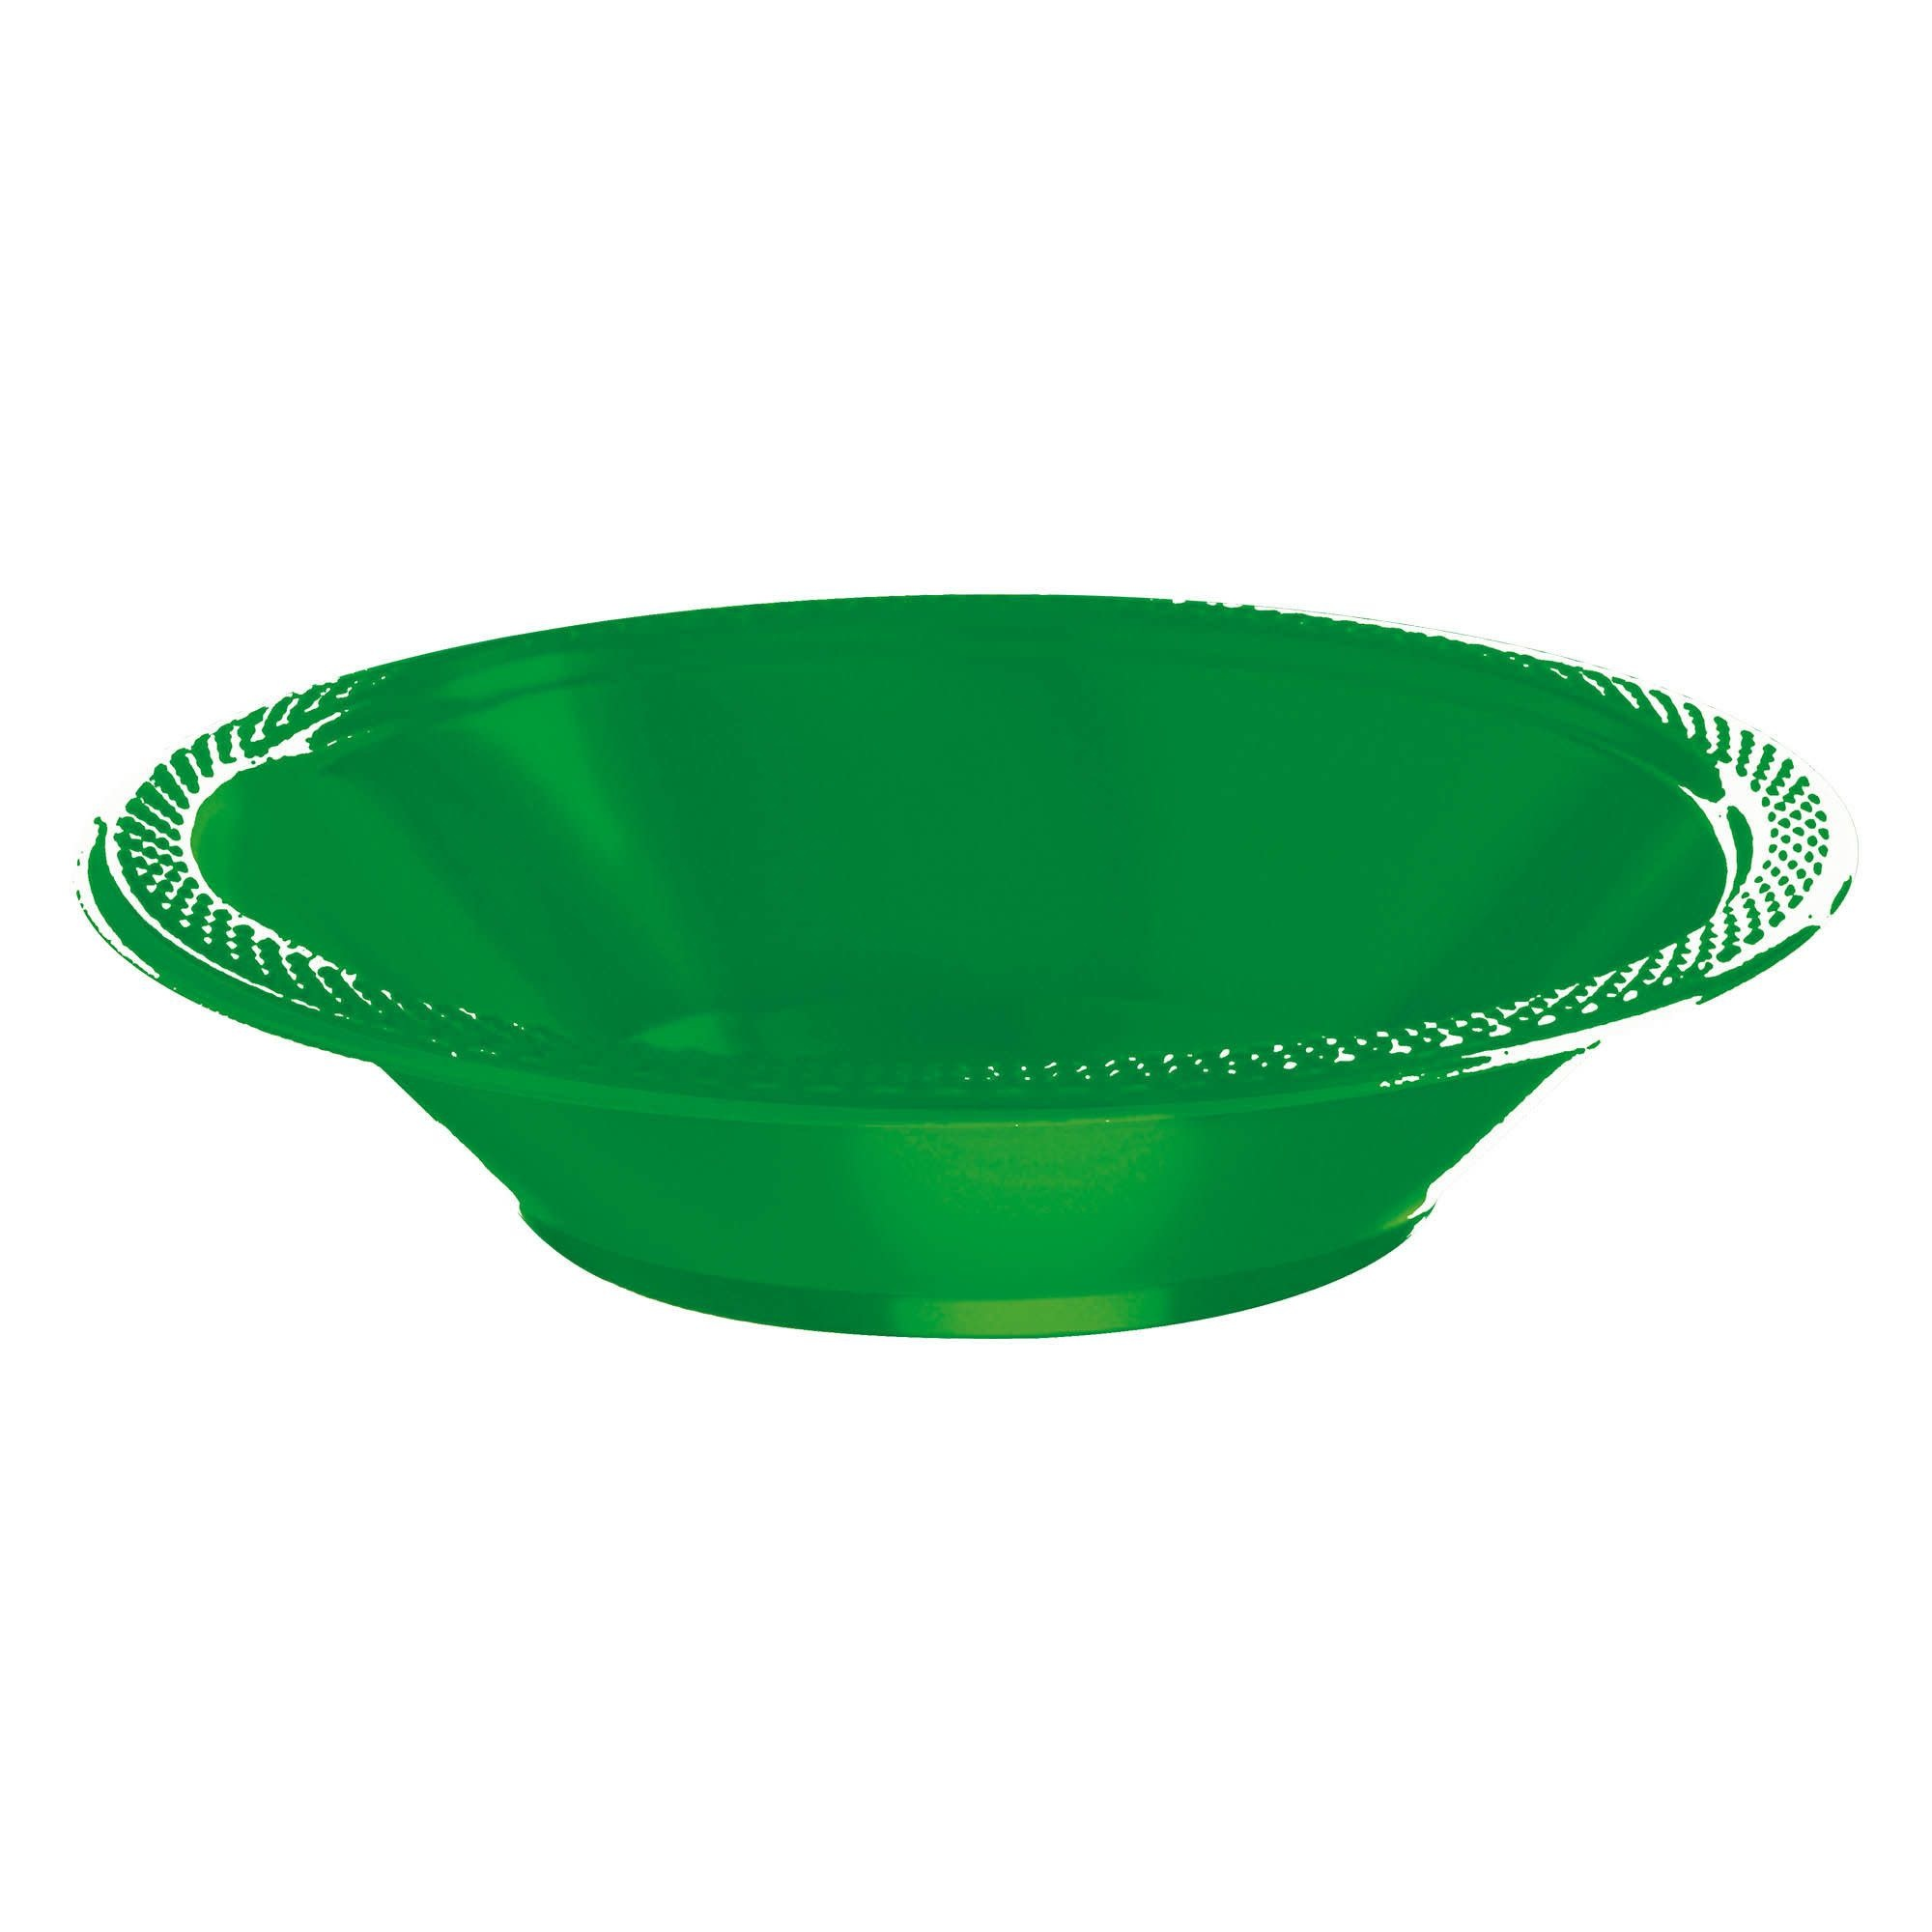 Festive Green Plastic Bowls, 12oz.